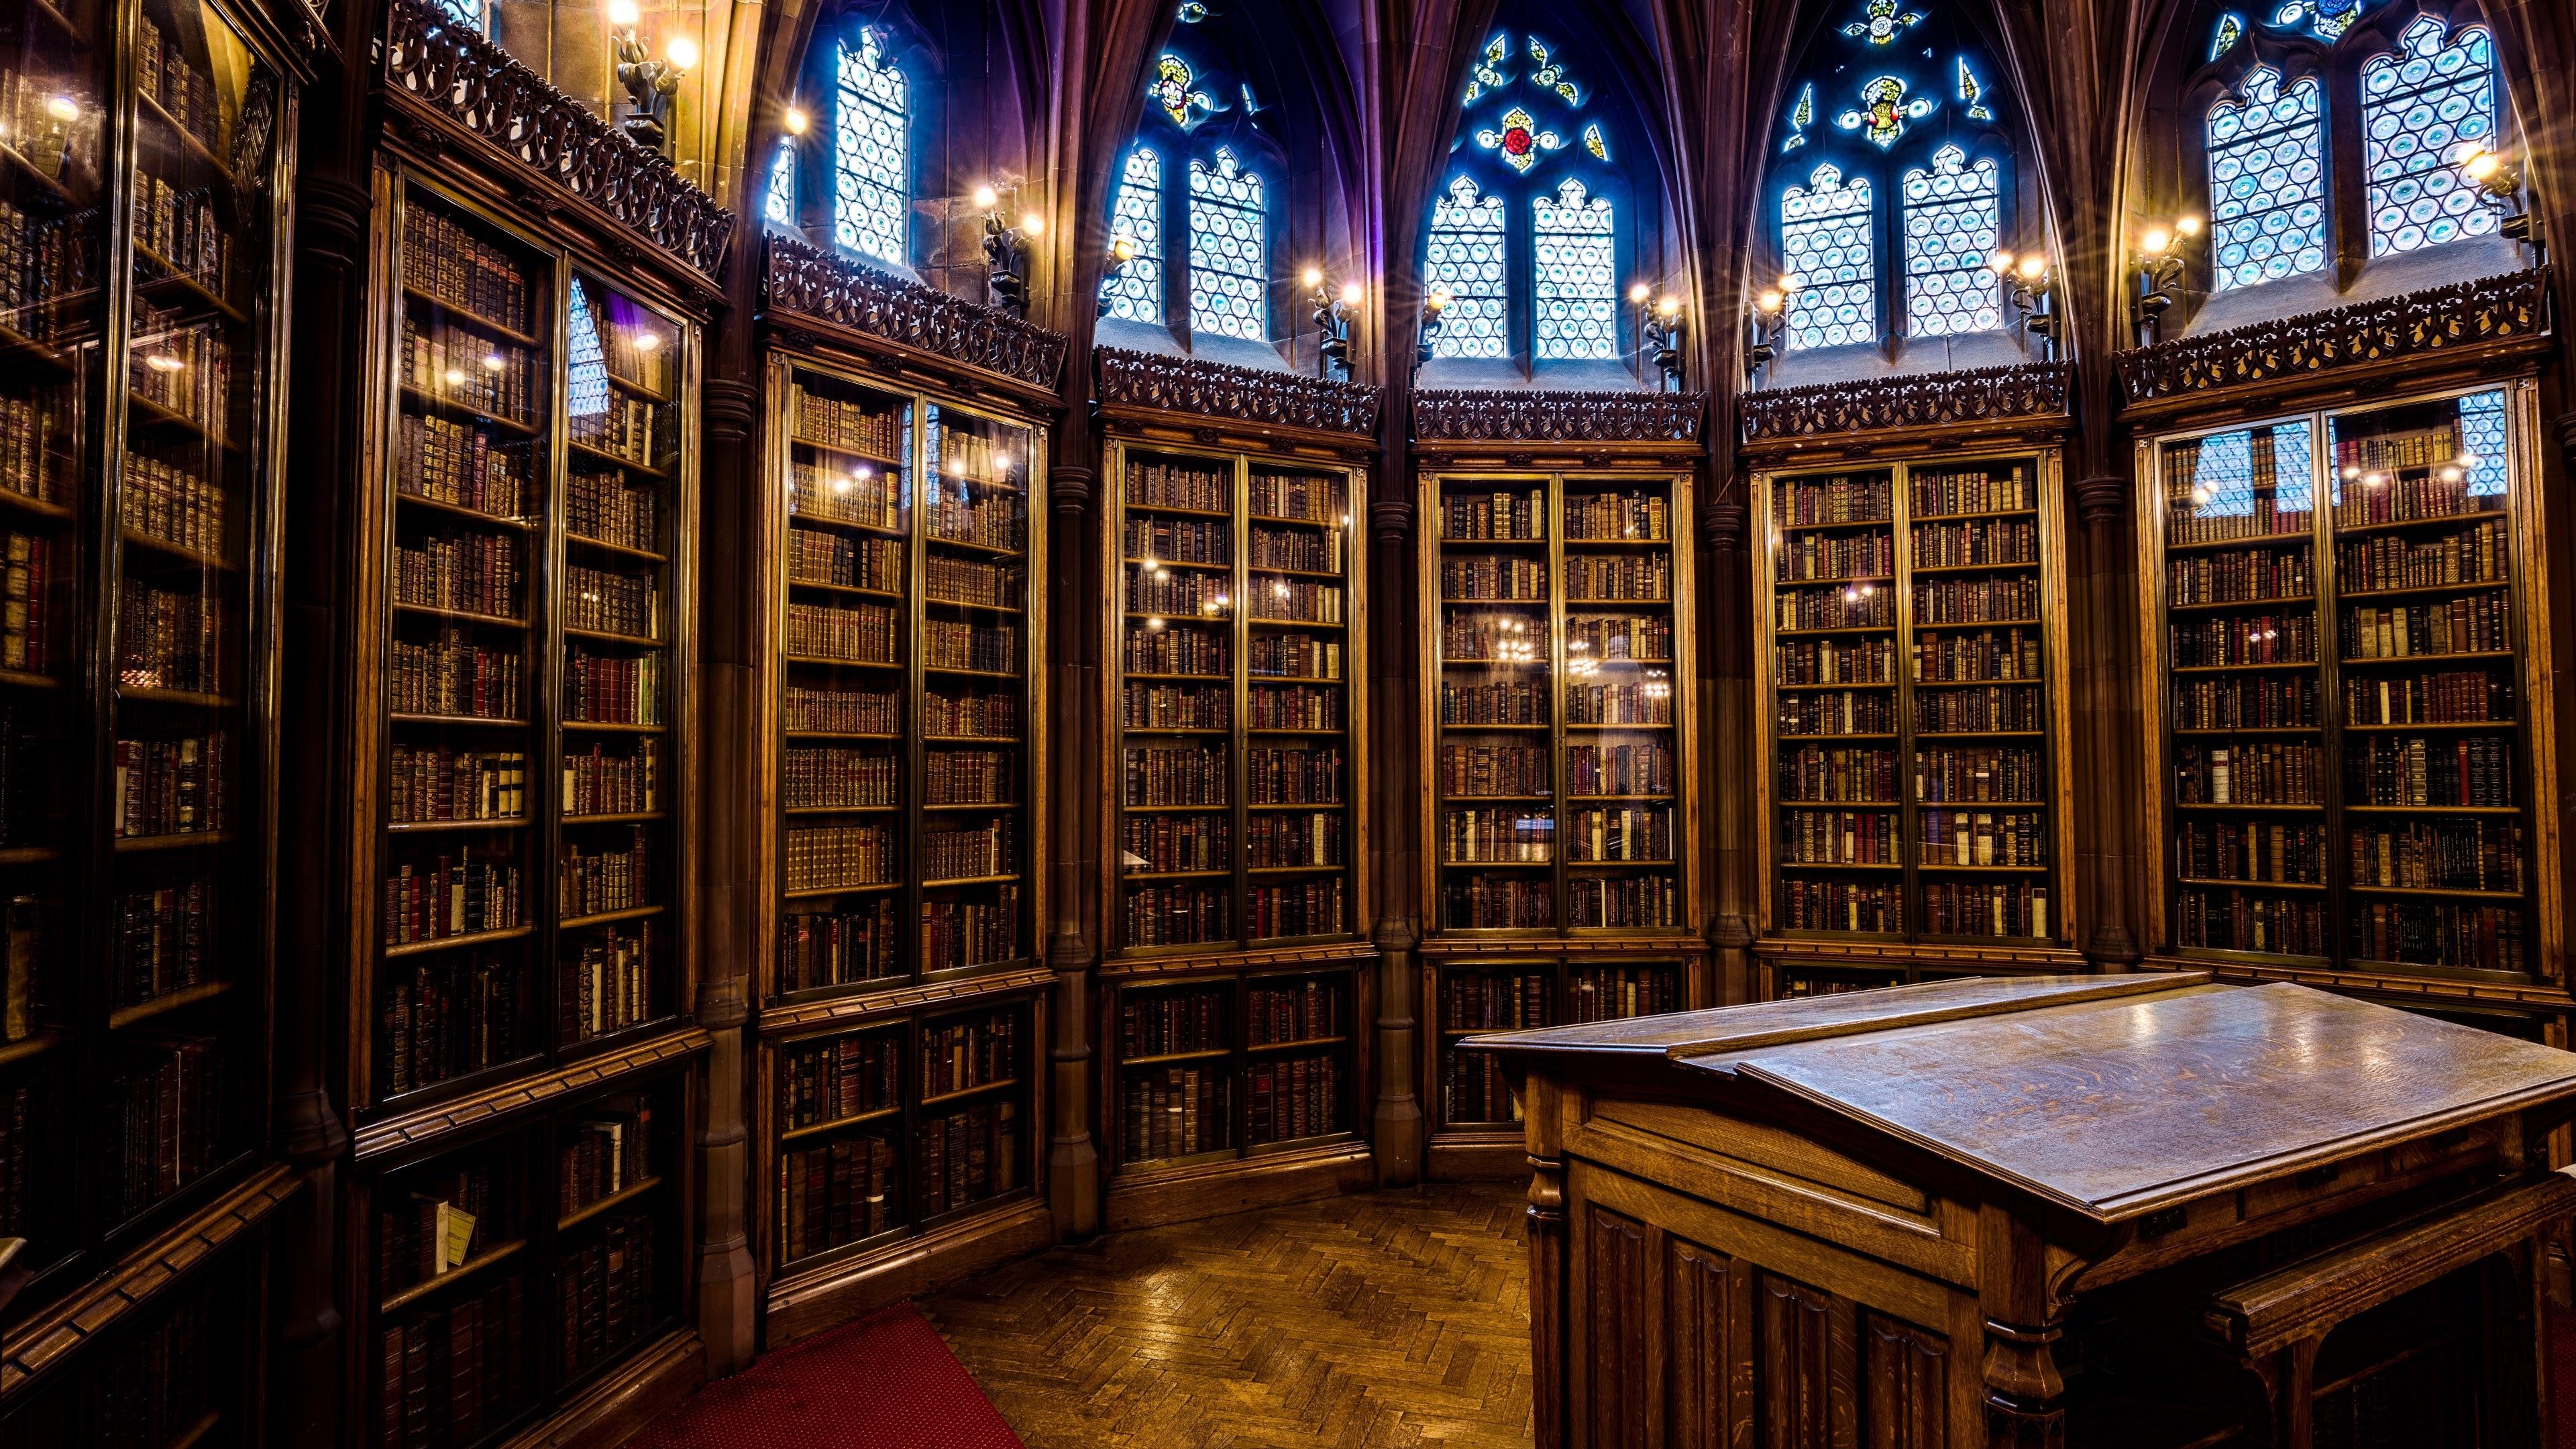 The John Rylands Library 4k Ultra HD Wallpaper